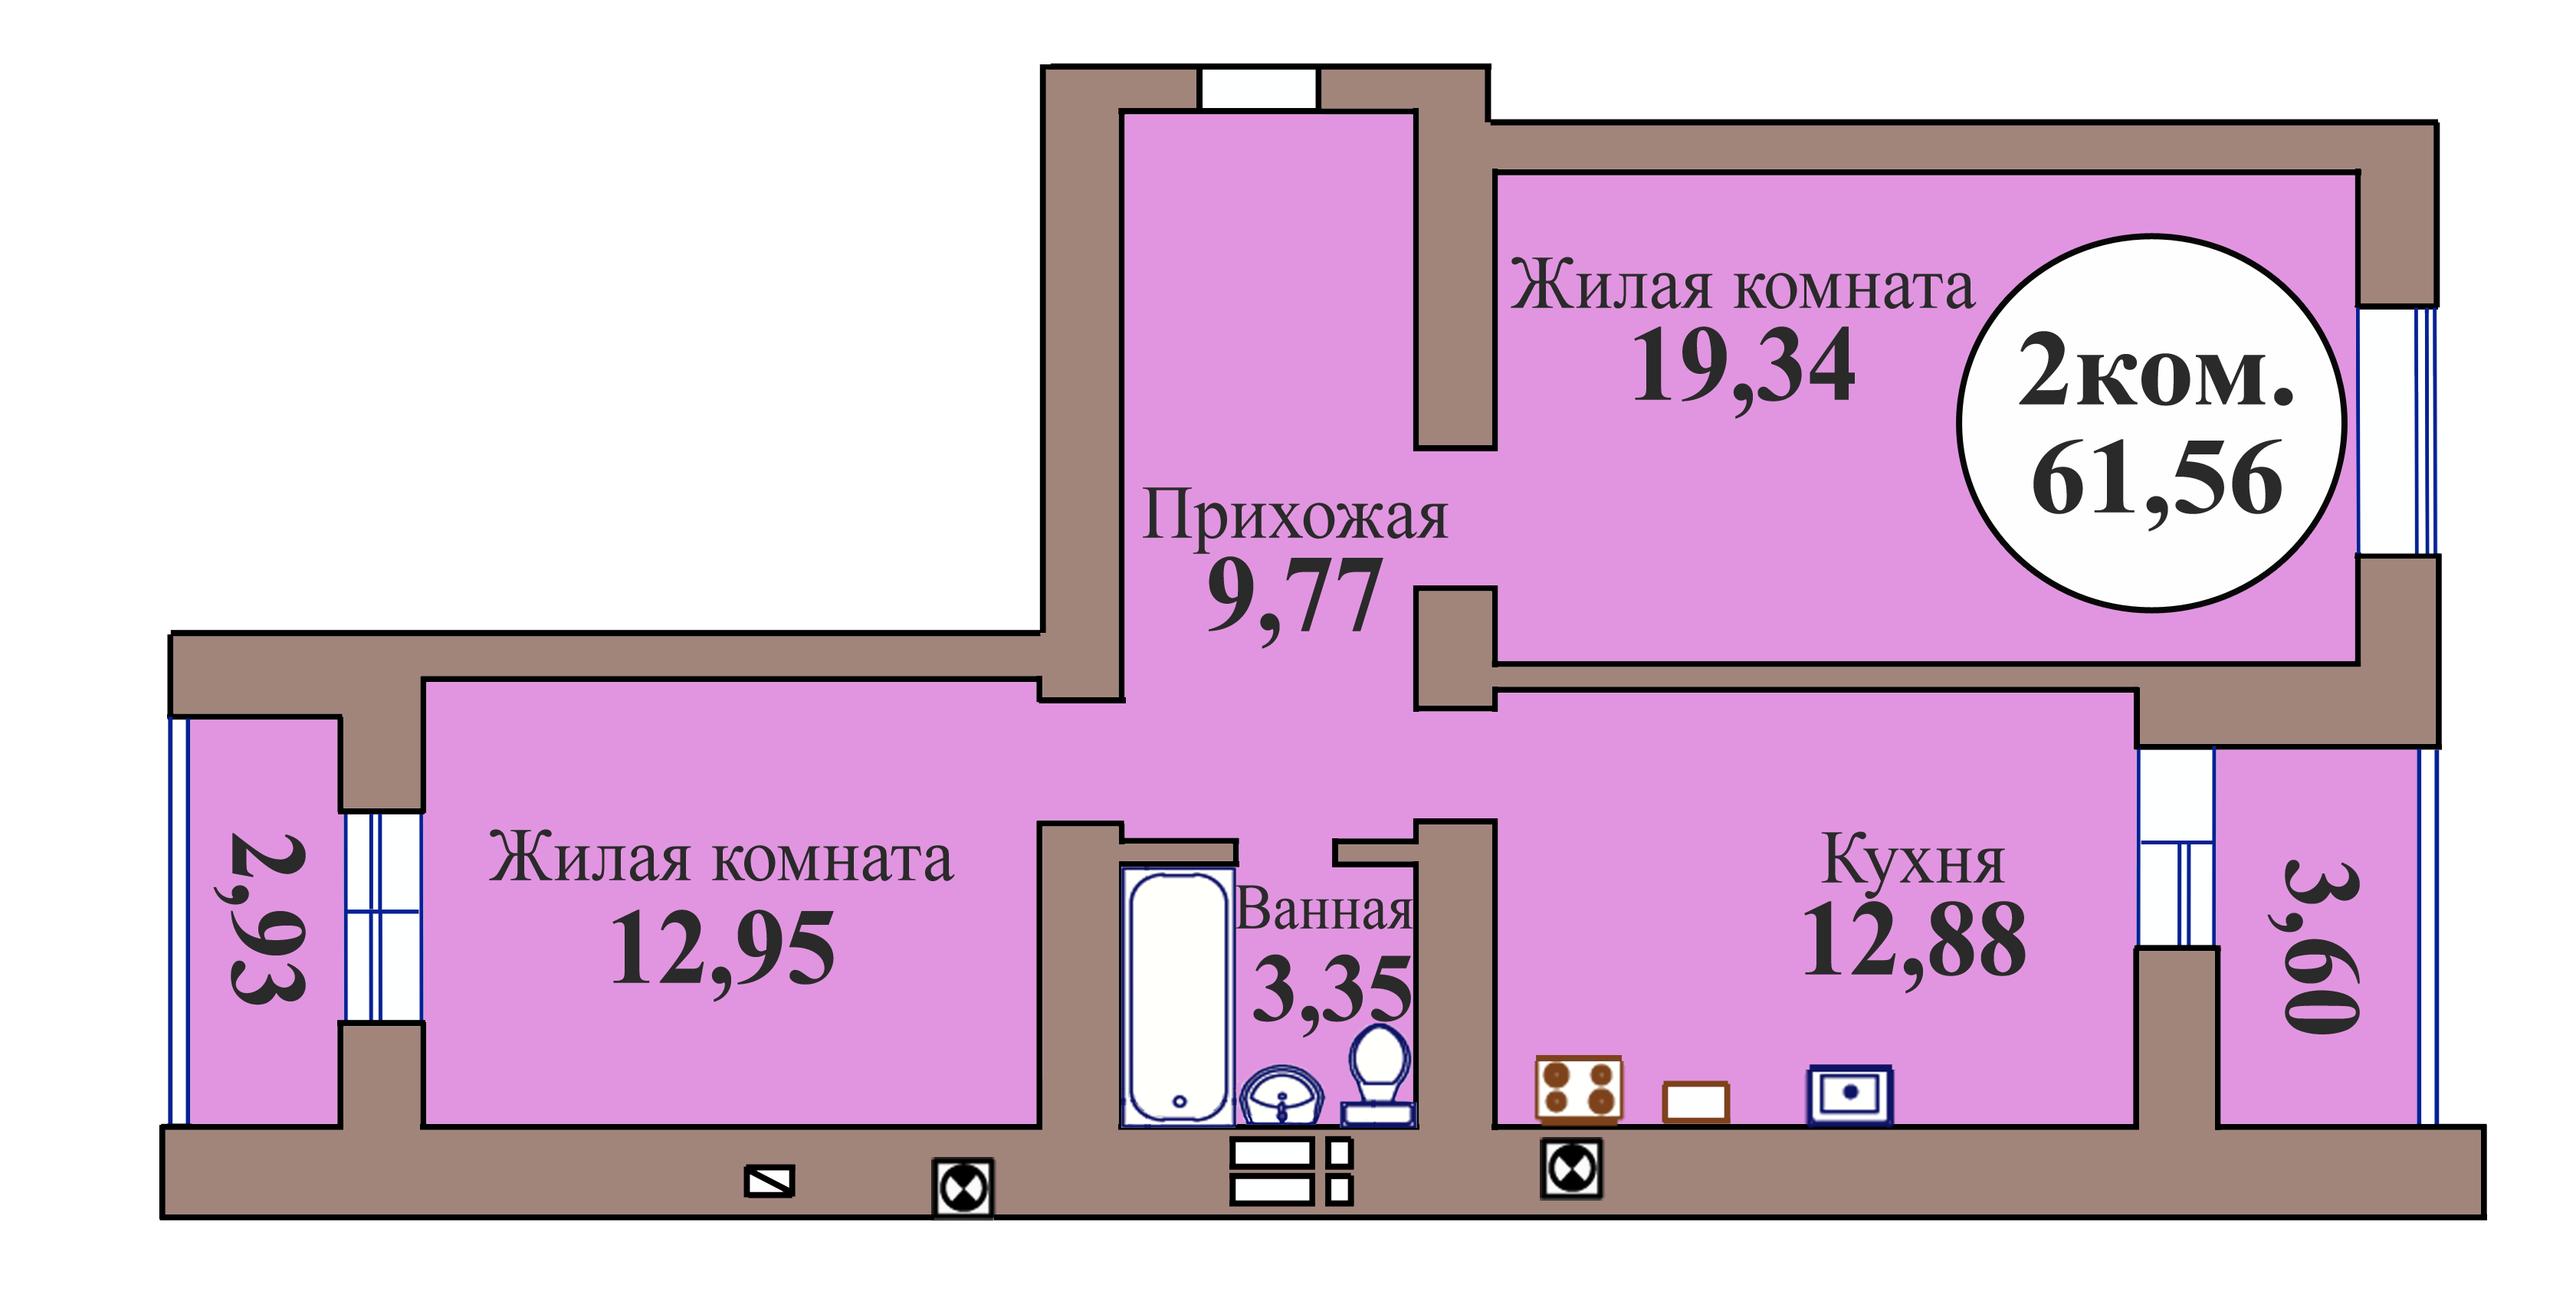 2-комн. кв. по пер. Калининградский, 5 кв. 113 в Калининграде